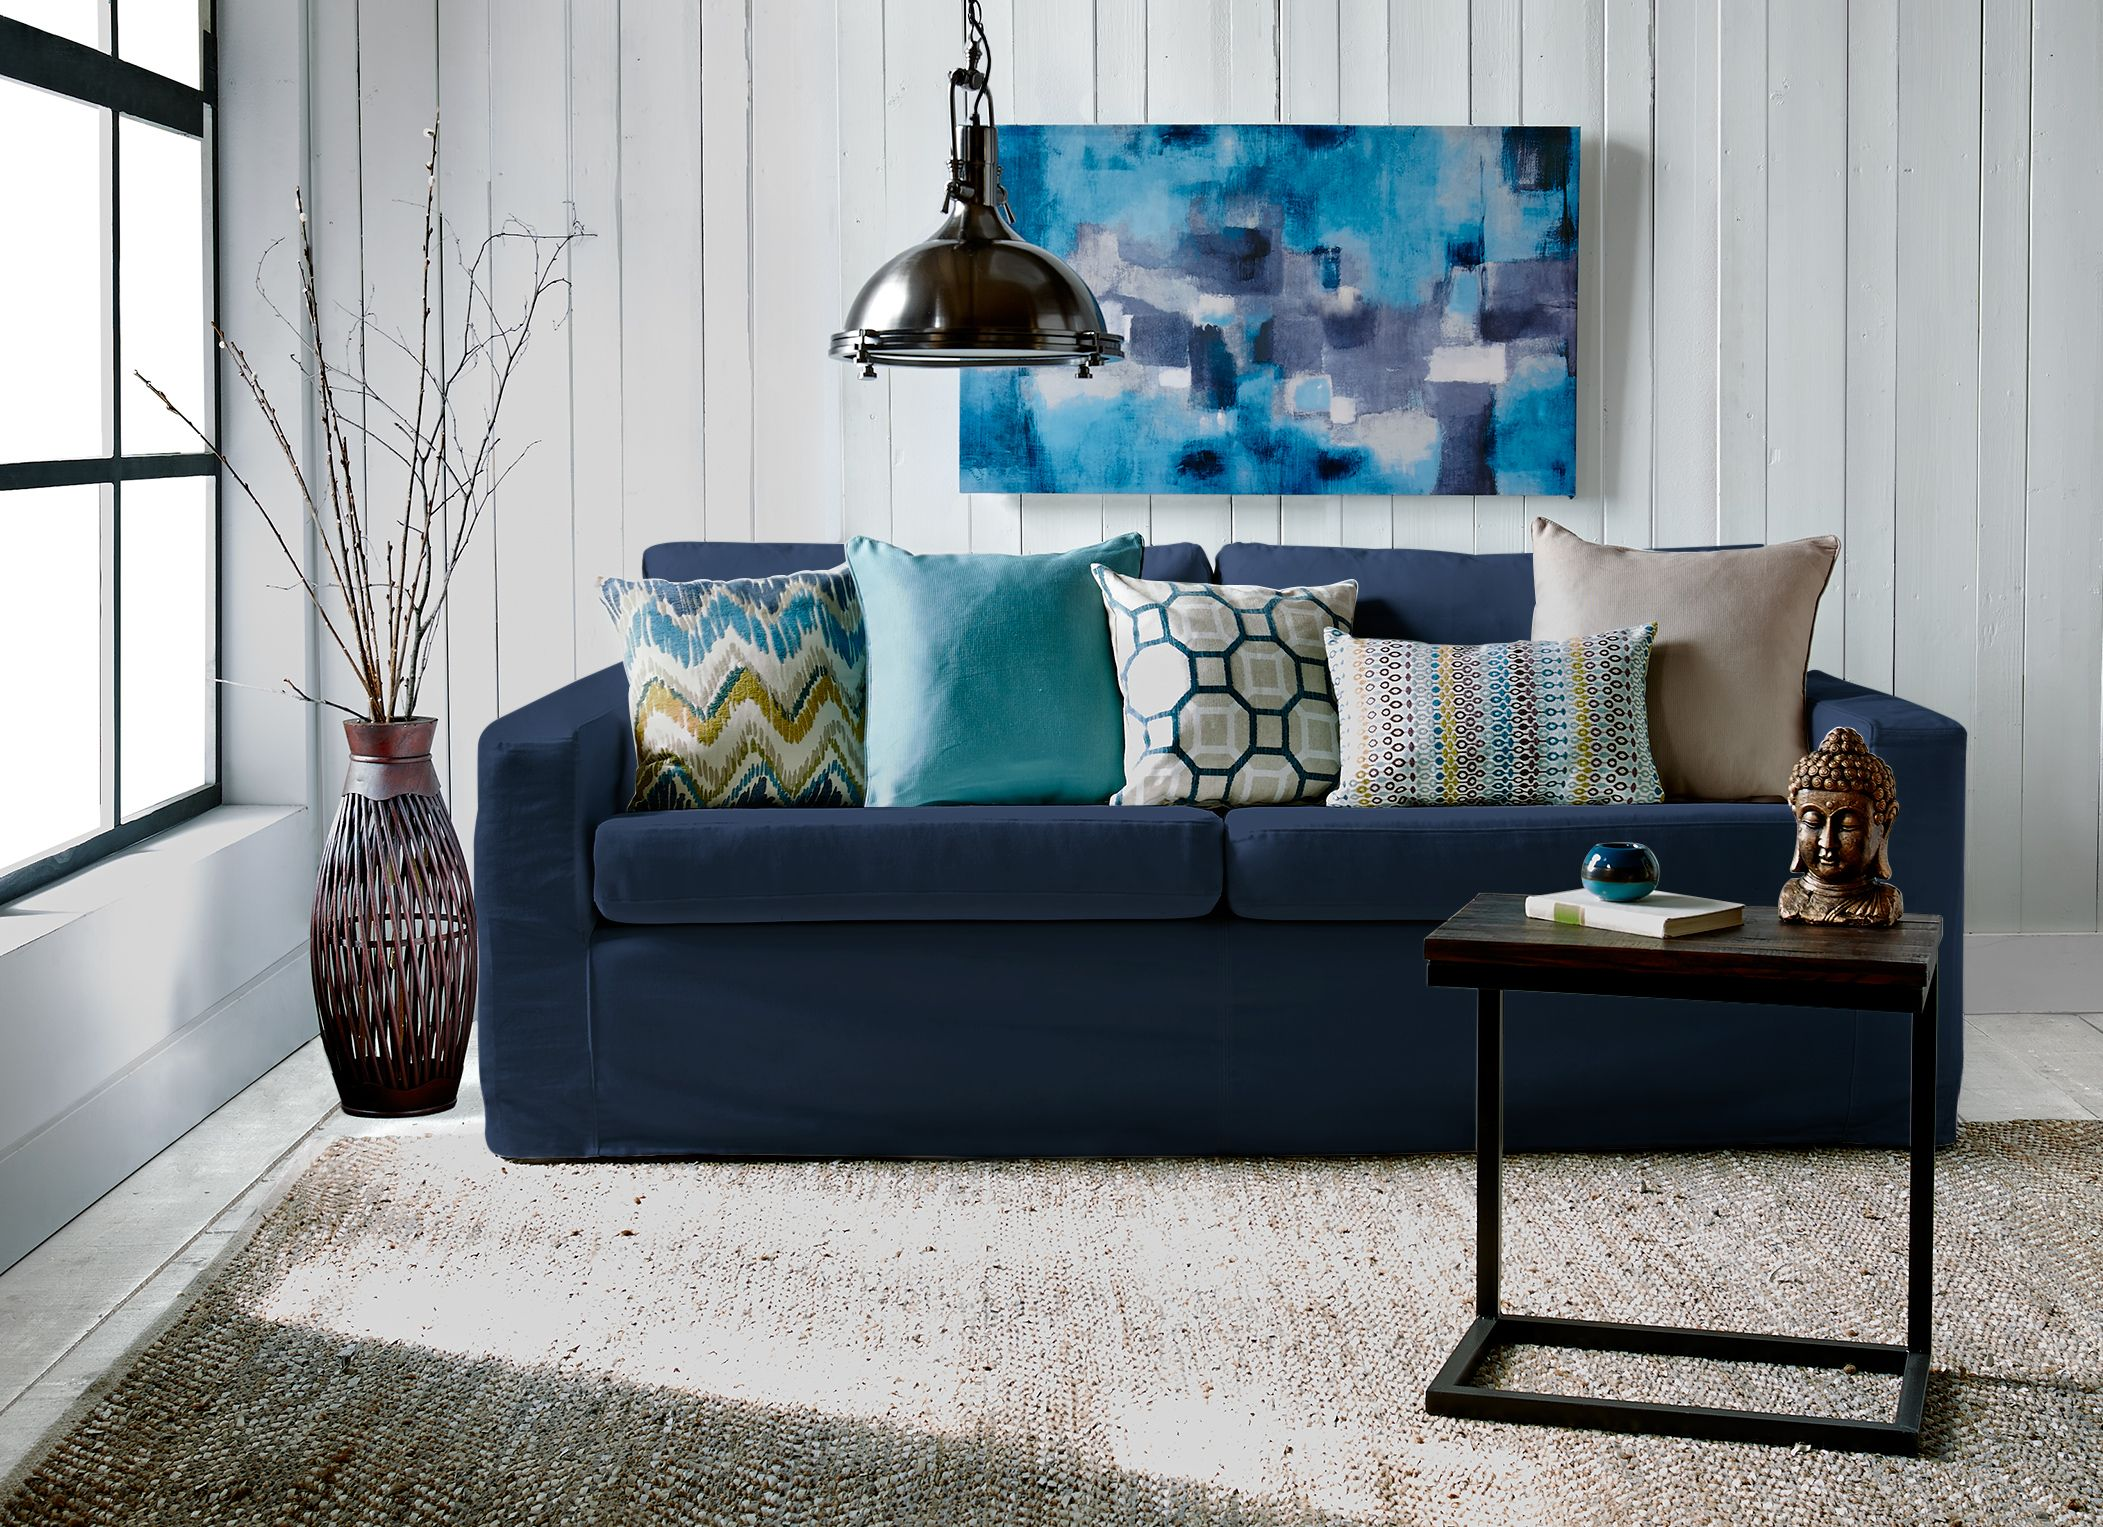 Boho Chic Living Room Decor | Décor de salle de séjour ...